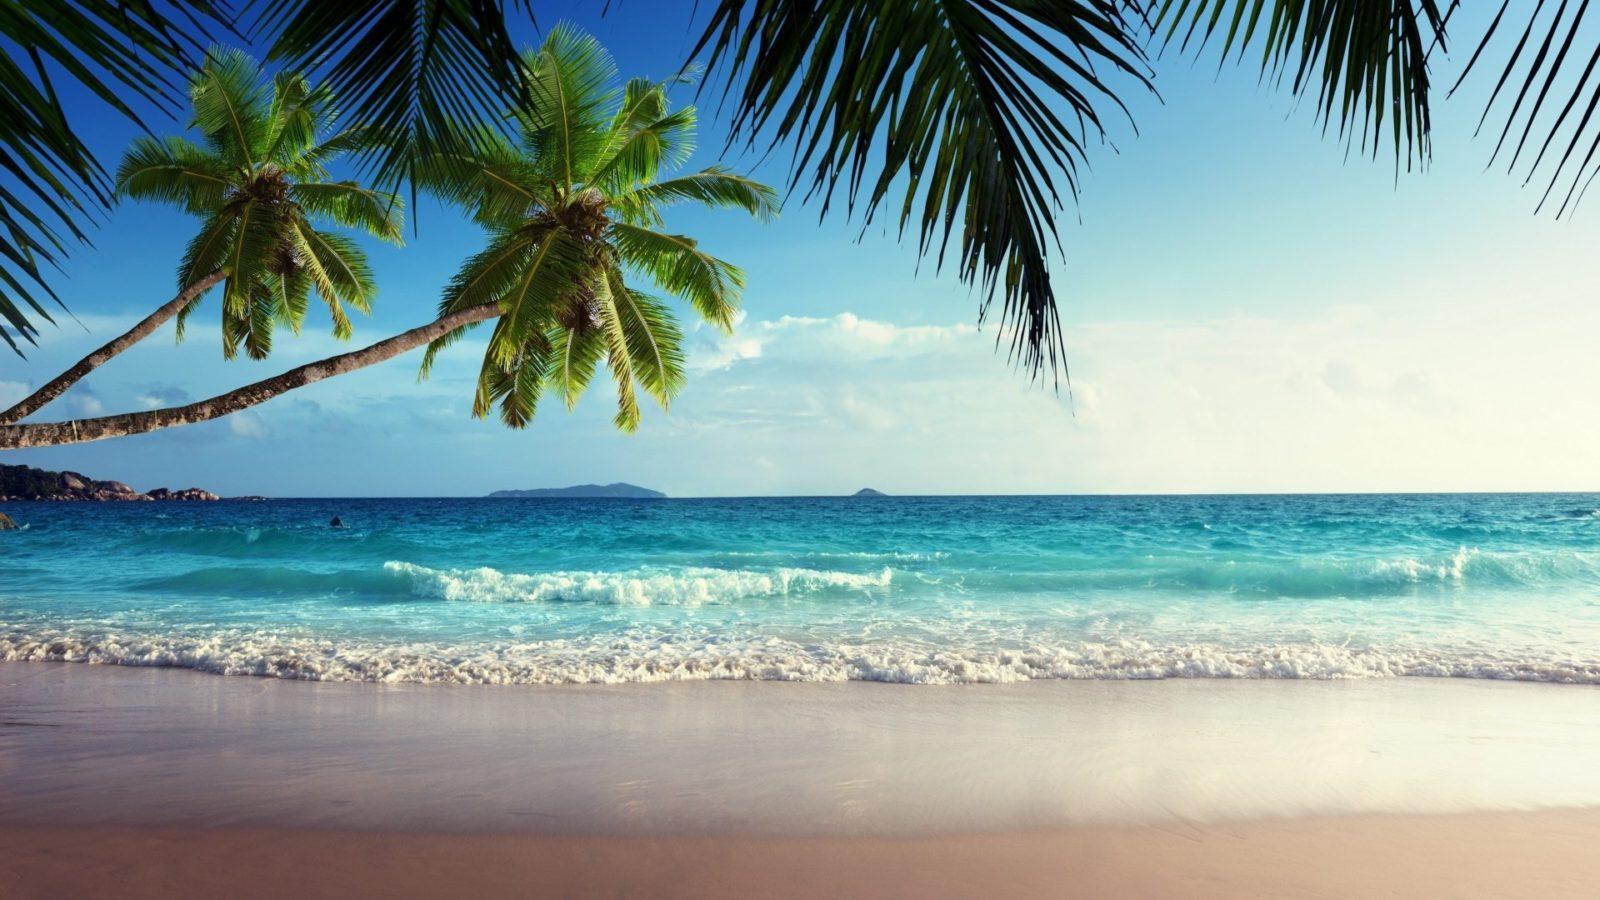 seychelles-best-tour-operator-madagascar-travel-to-mauritius